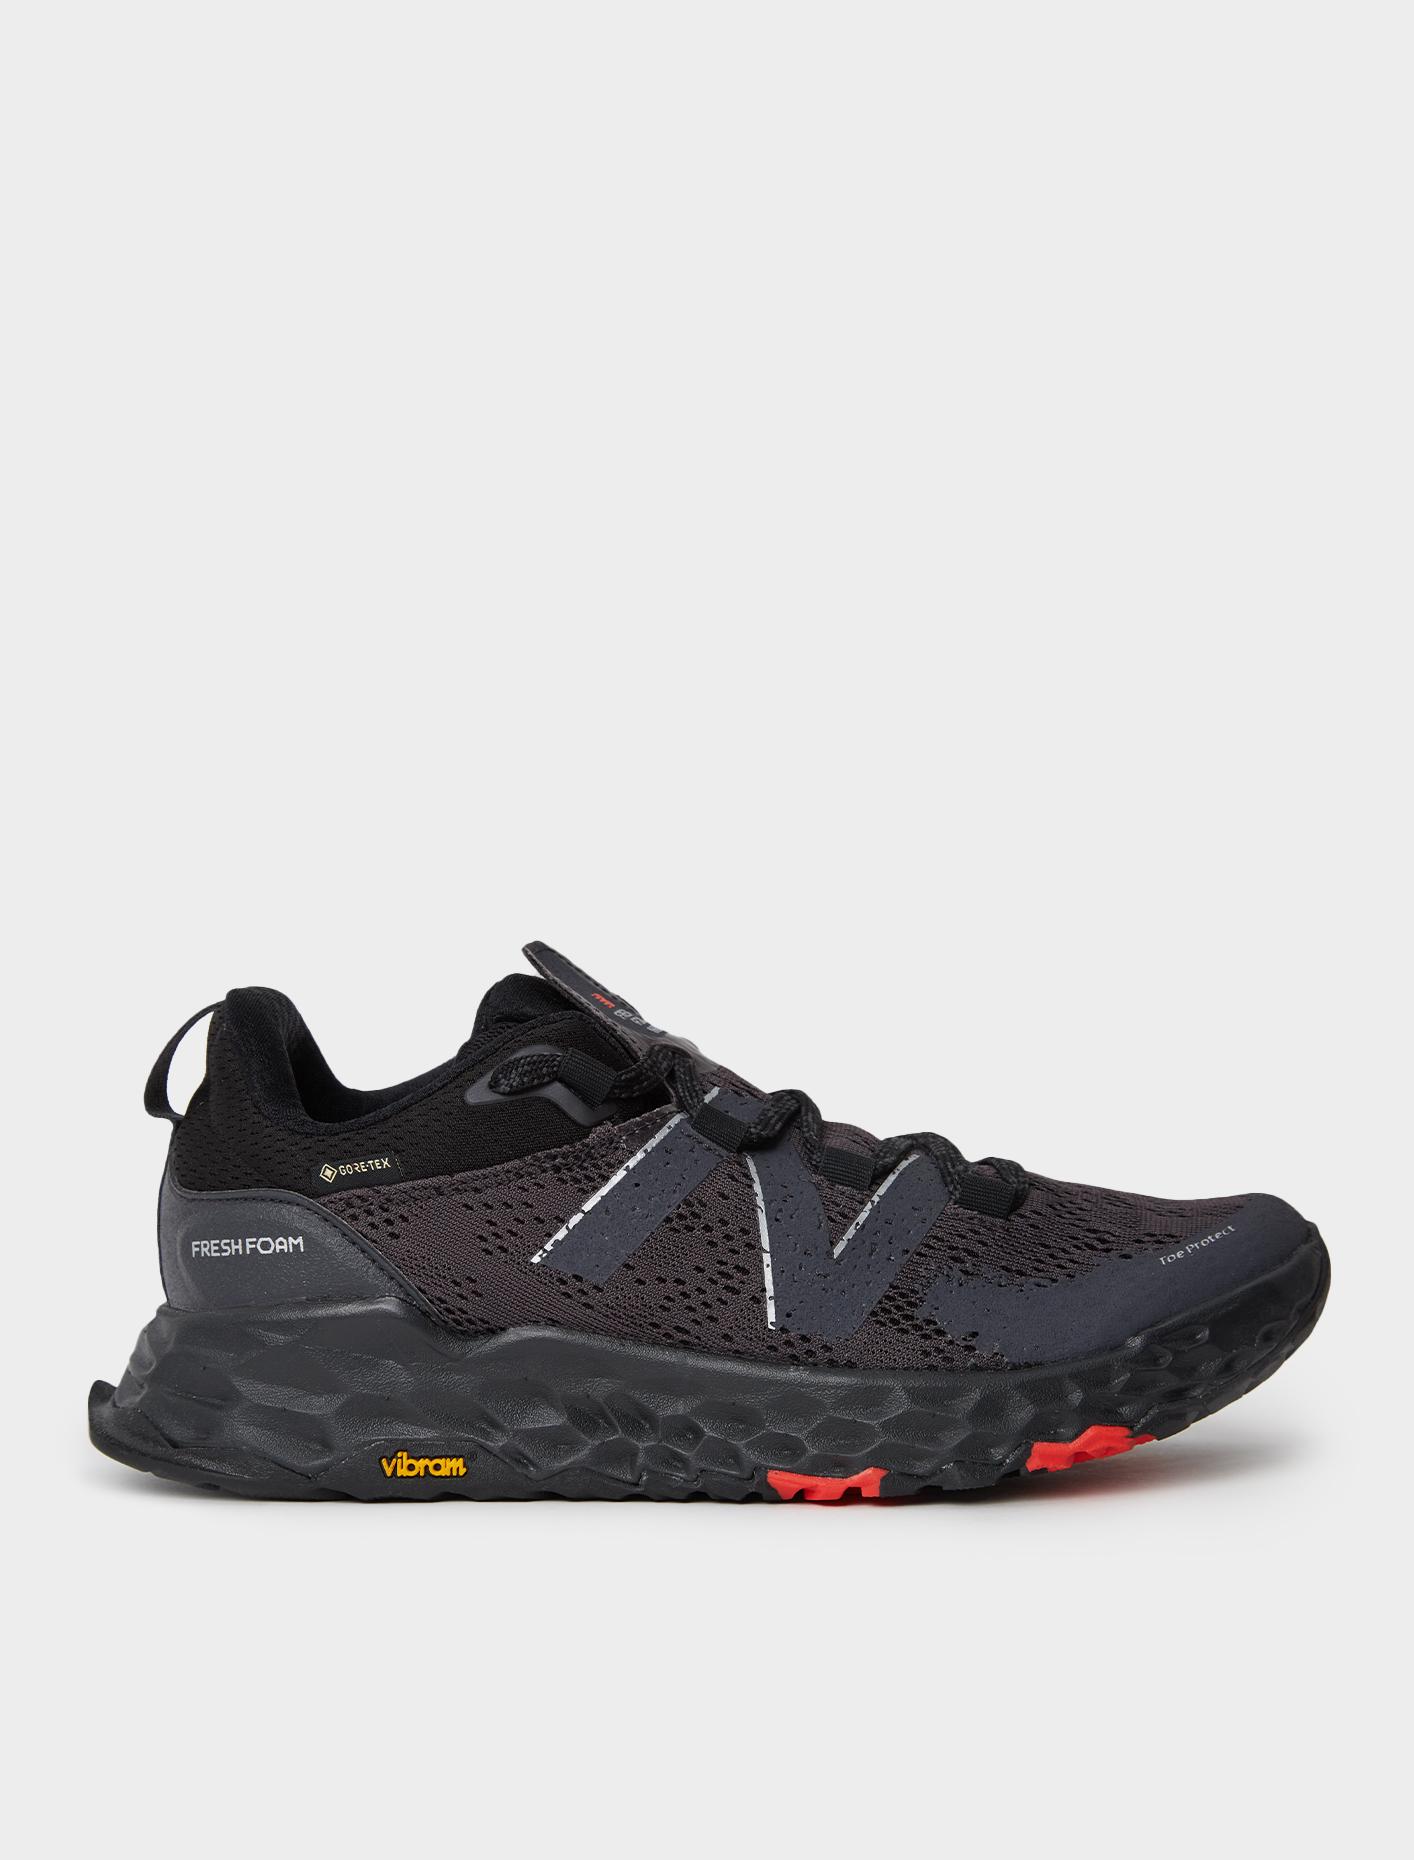 New Balance MTHIEBX5 Sneaker in Black